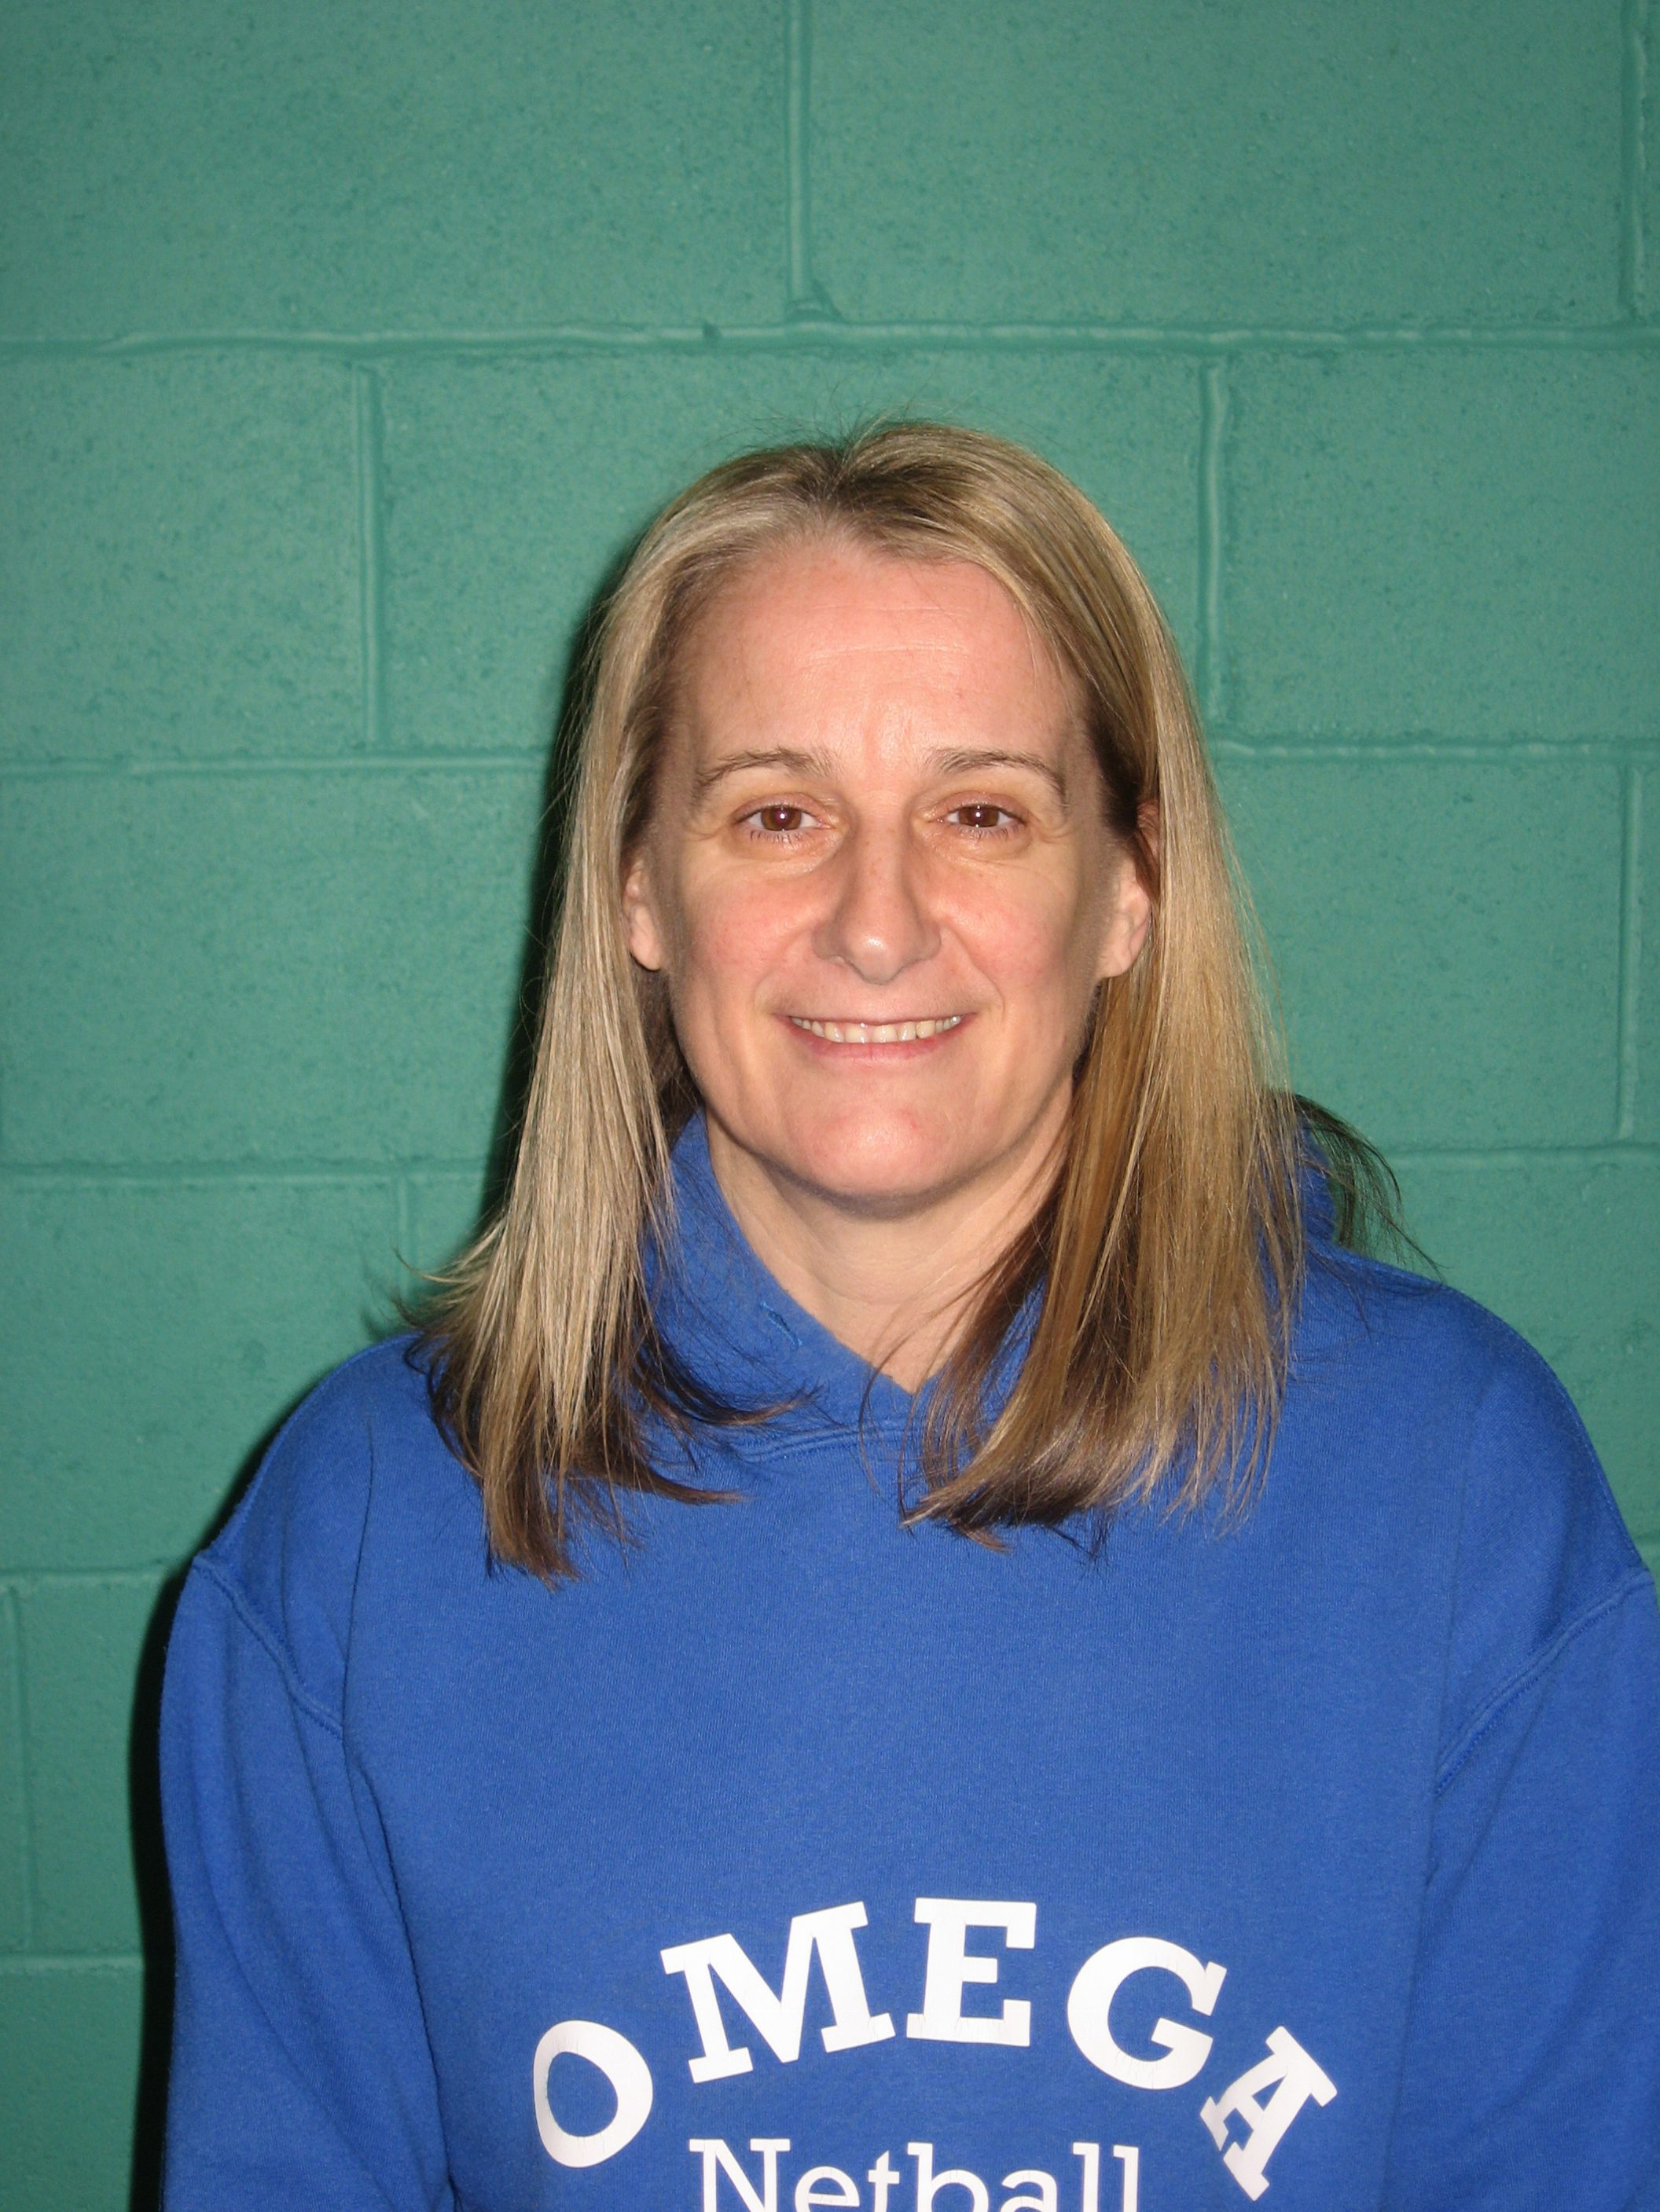 Andrea Coach